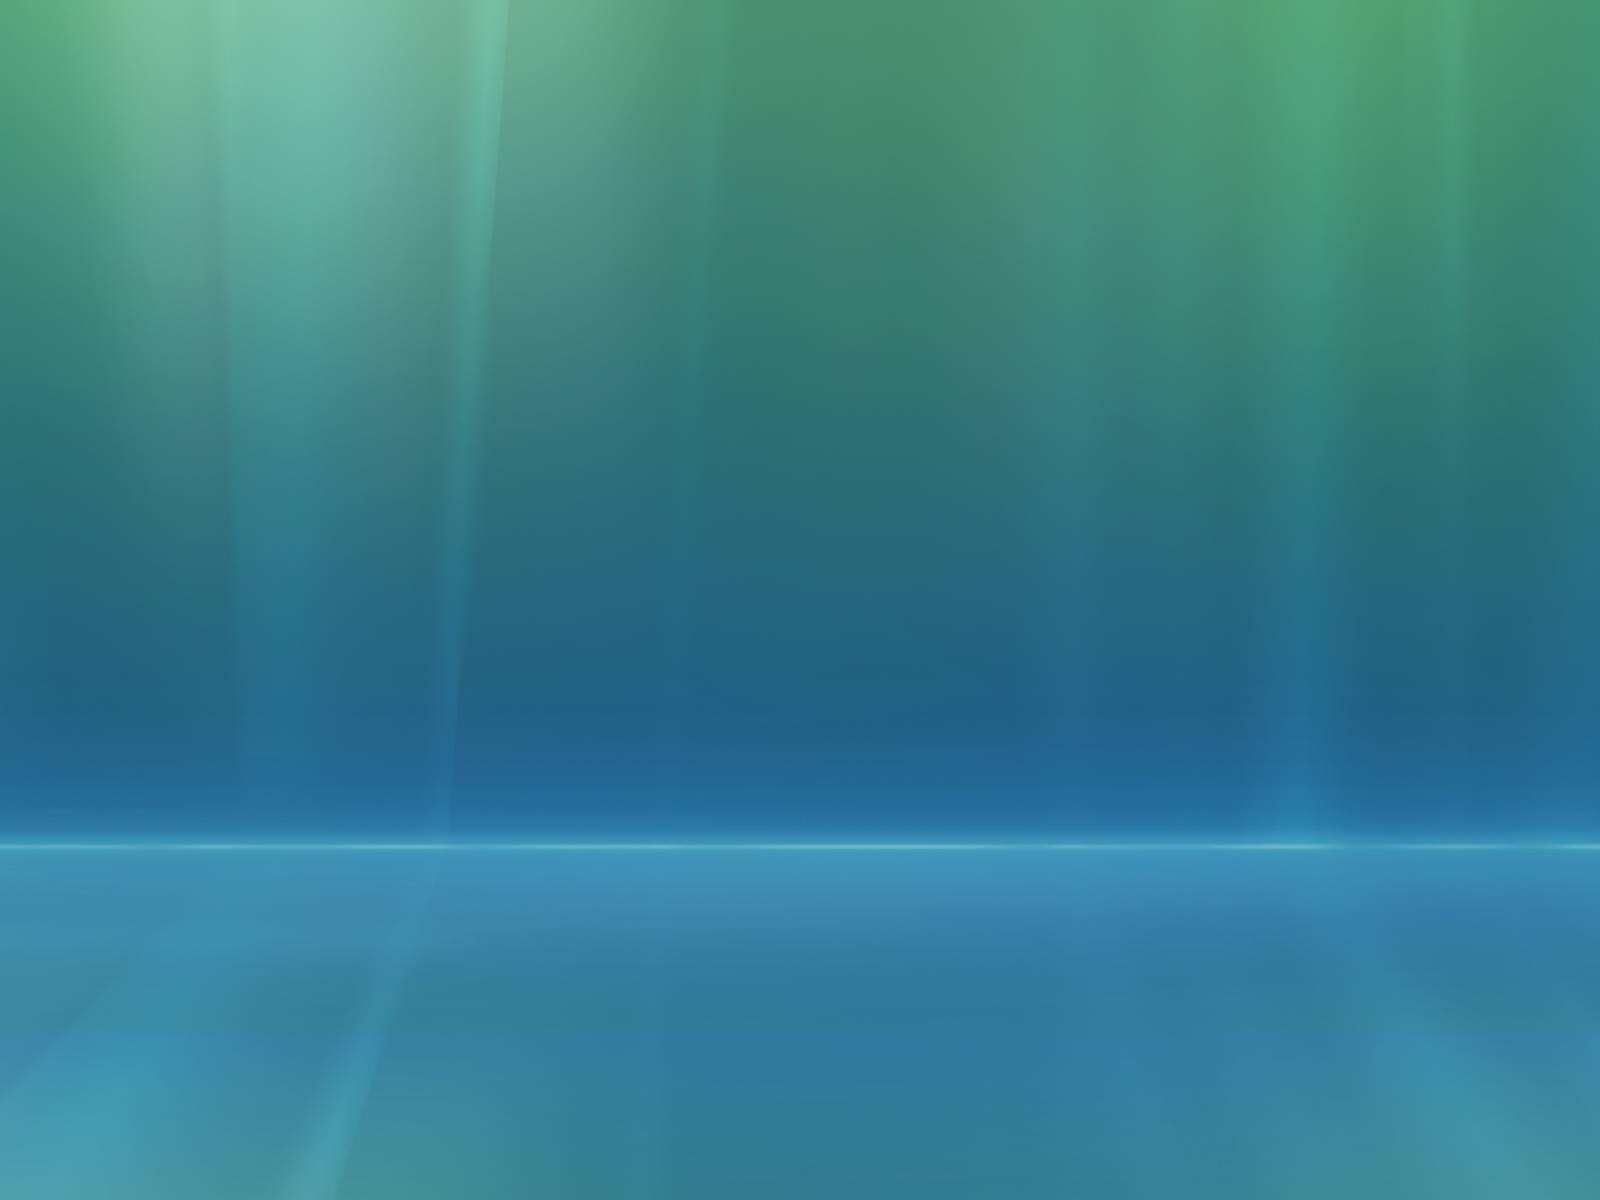 Windows Vista Aurora Wallpaper Wallpapersafari